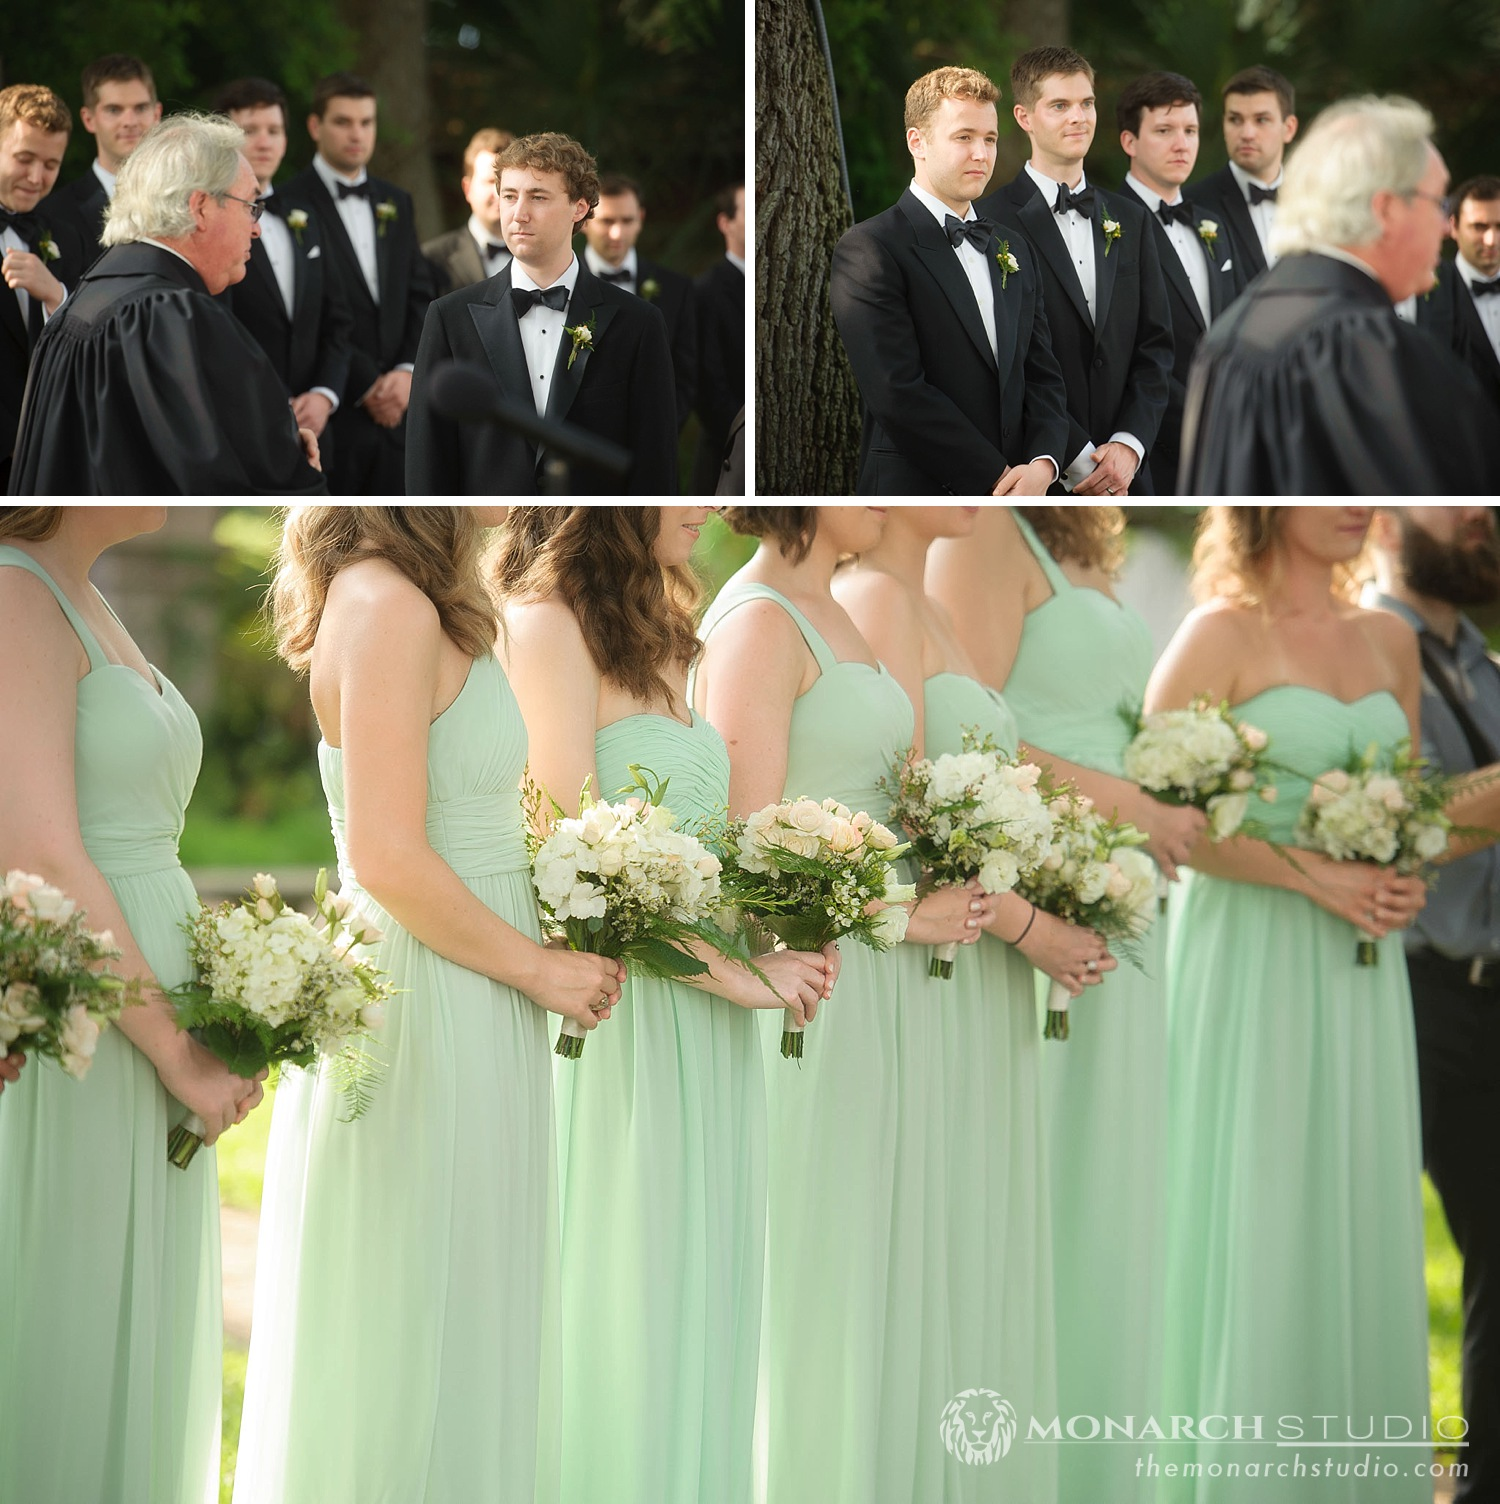 St-Augustine-Wedding-Photographer-Zach-Thomas-Riverhouse-Monarch-069.JPG